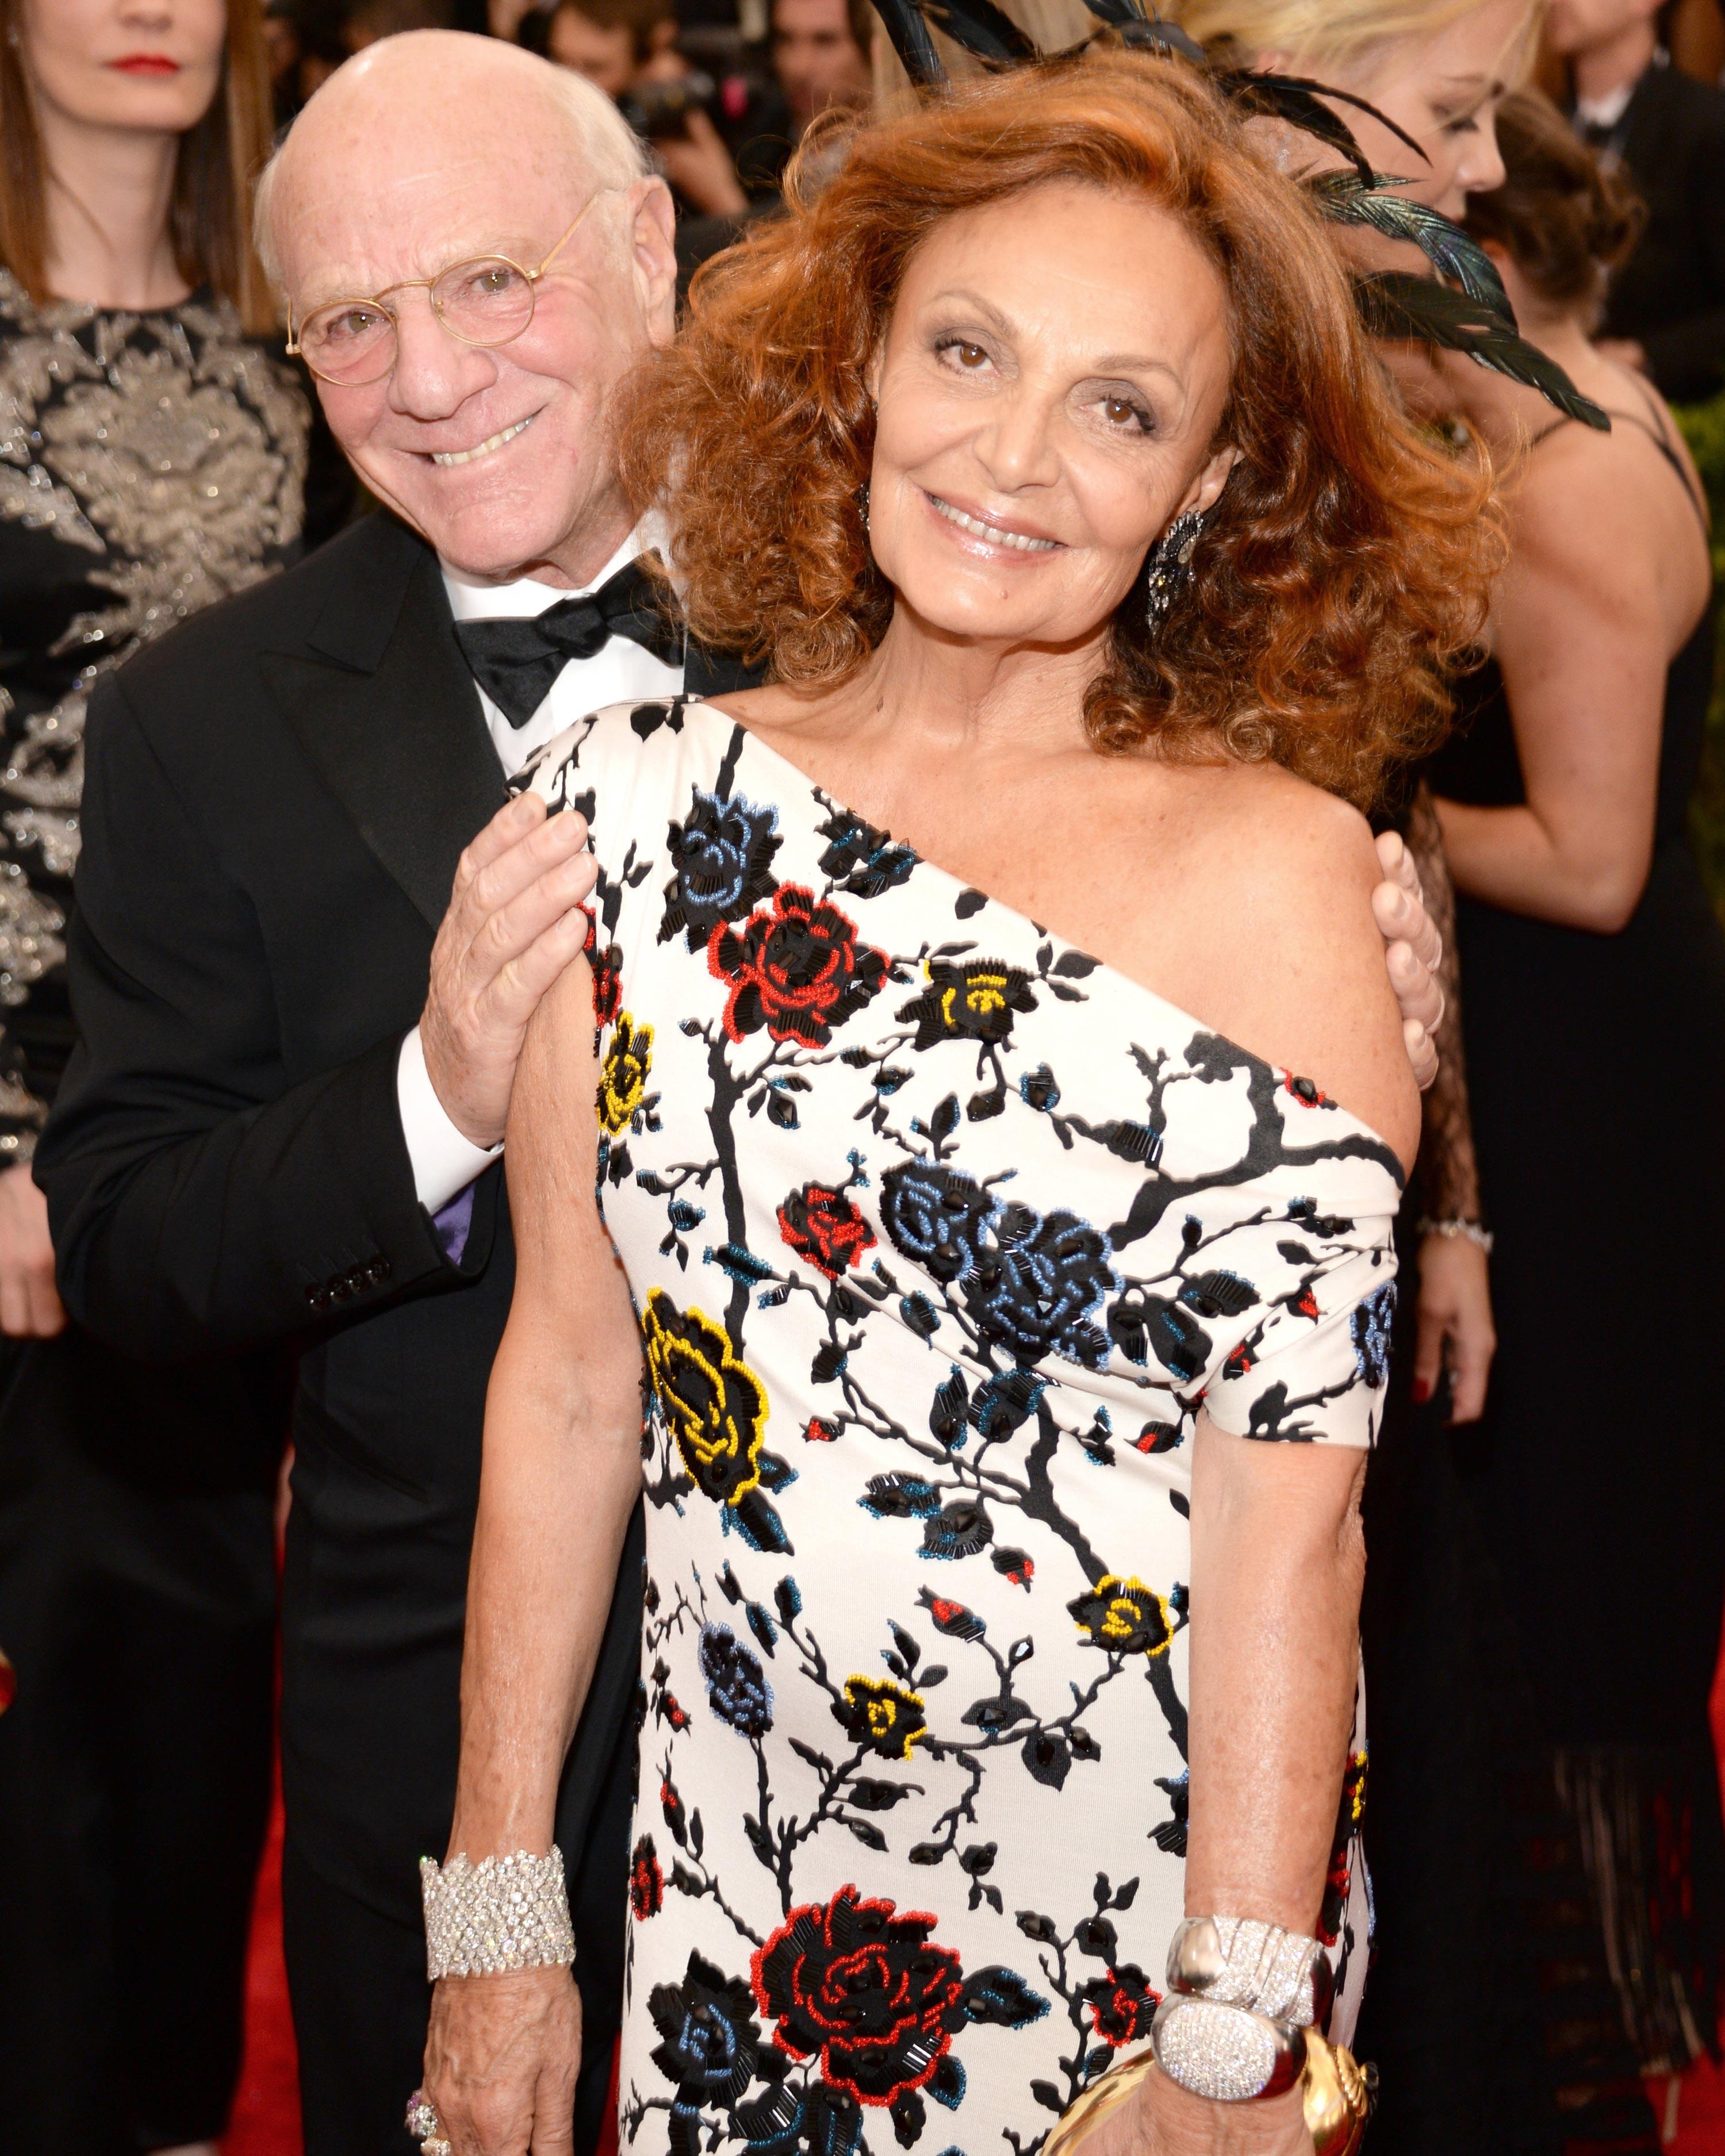 diane-von-furstenberg-barry-diller-iconic-hollywood-couples-0216.jpg